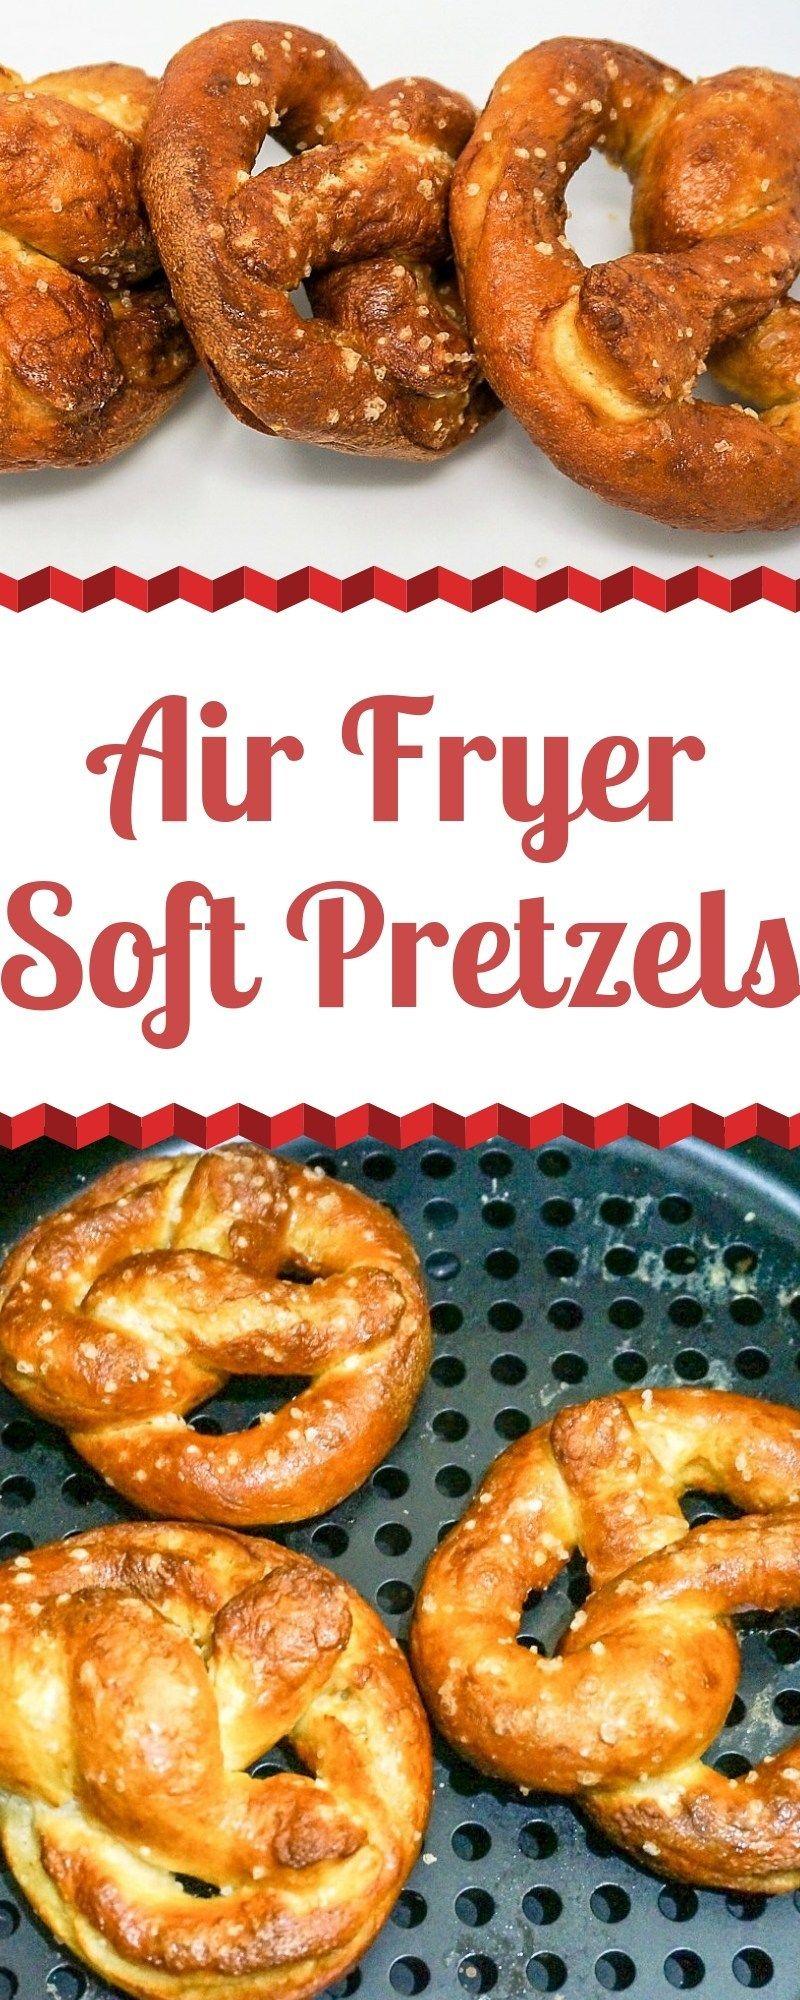 Air Fryer Soft Pretzels | Grace Like Rain Blog #airfryerrecipes